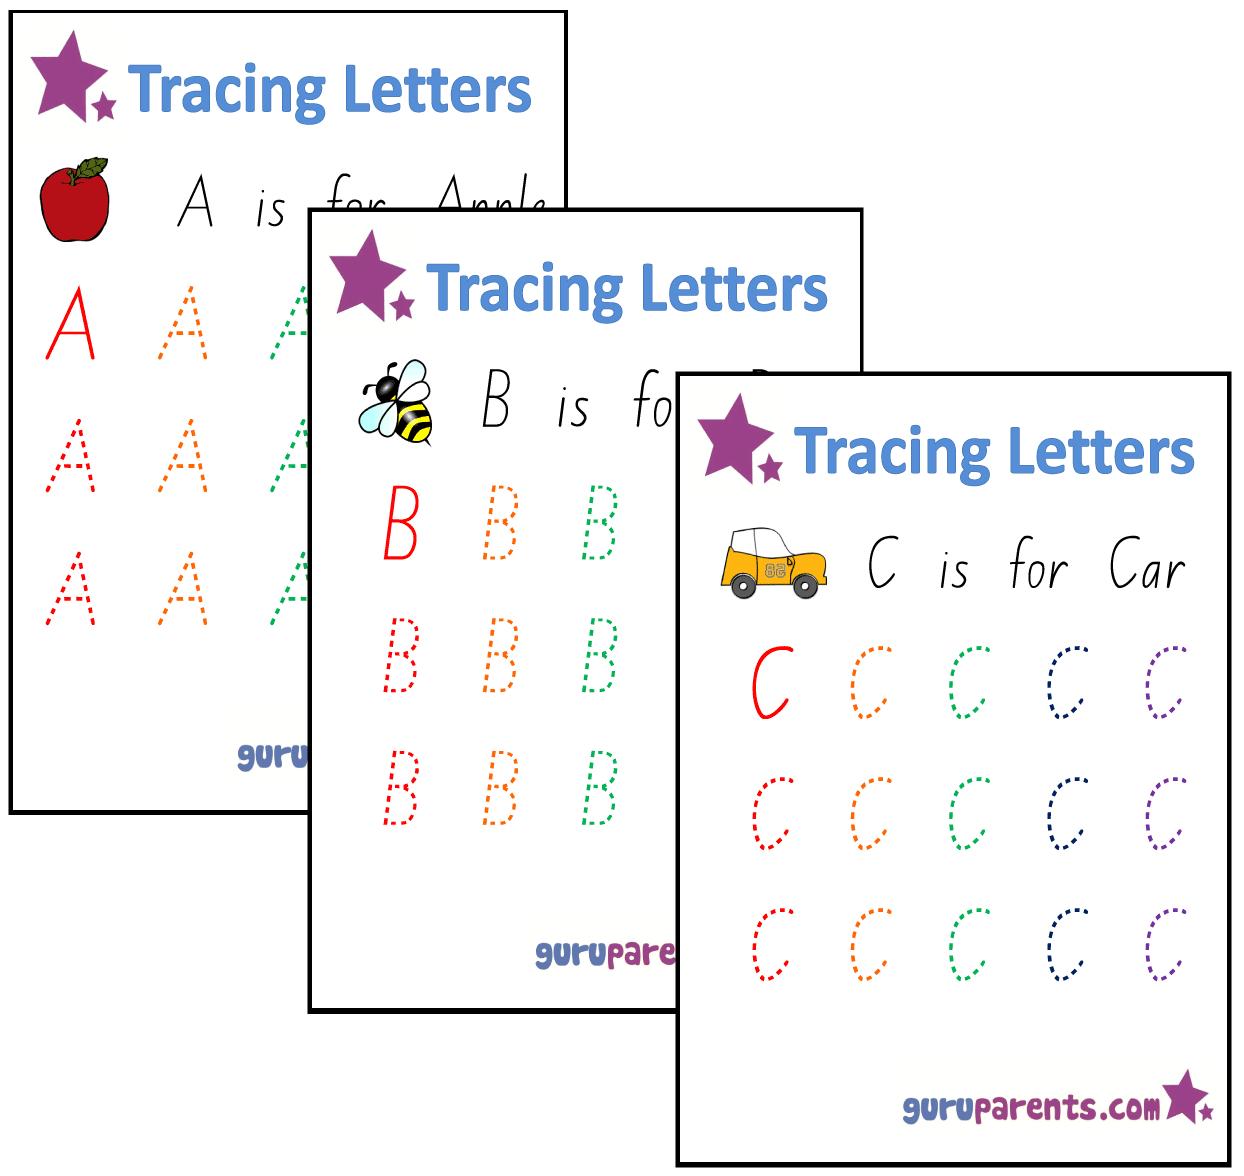 Alphabet Worksheets For Kindergarten Worksheets For Preschool Alphabet Worksheets Alphabet Worksheets Kindergarten Alphabet Kindergarten [ 1176 x 1244 Pixel ]